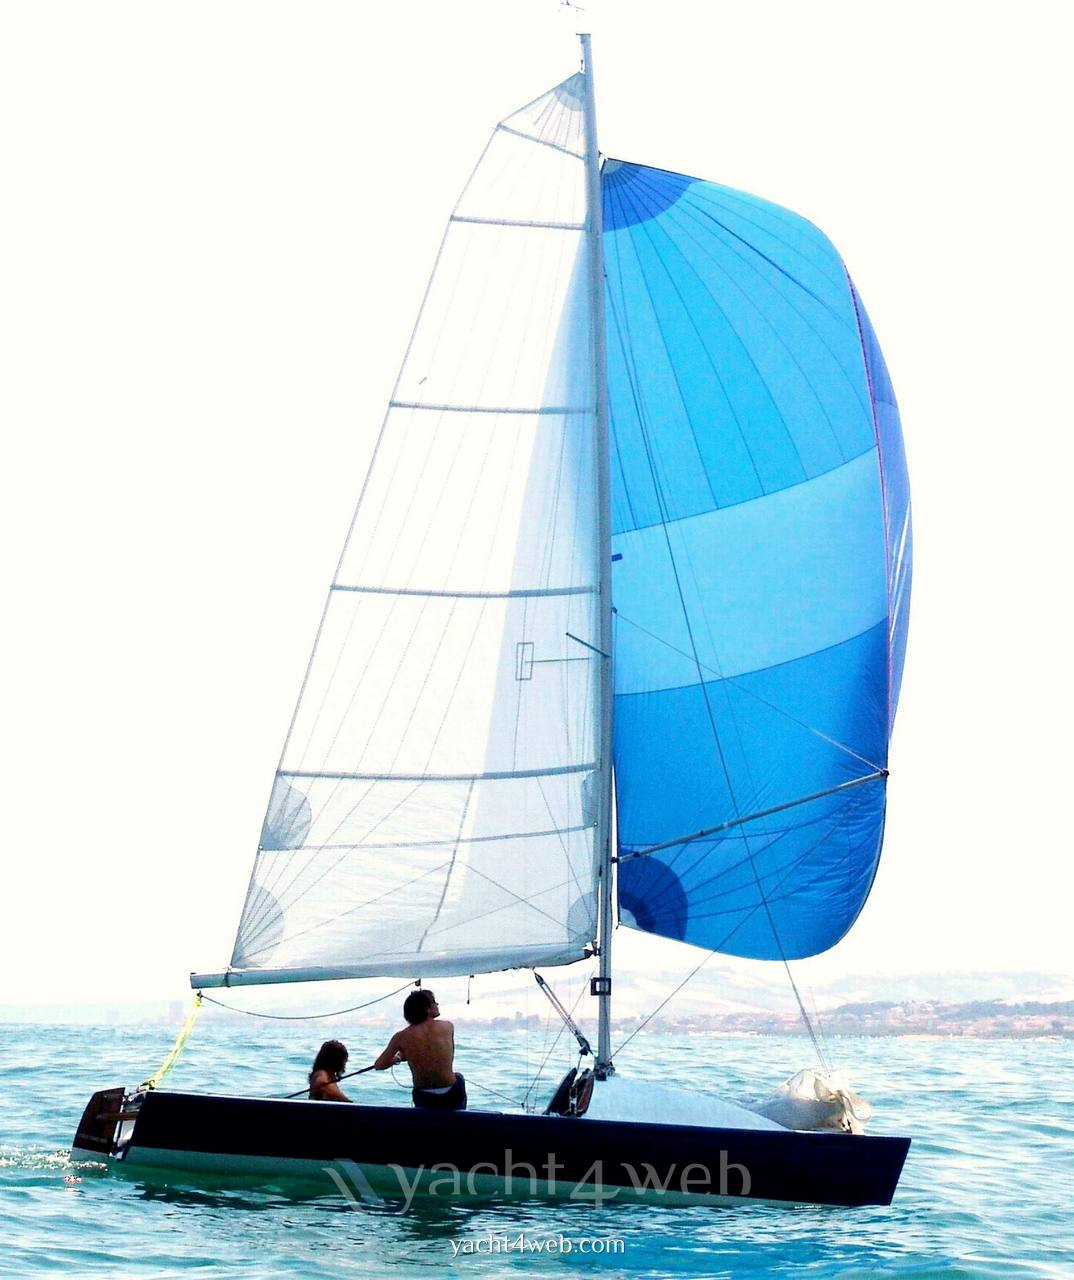 Mastro-d-ascia Spectre 20 day sailer Sailing boat used for sale